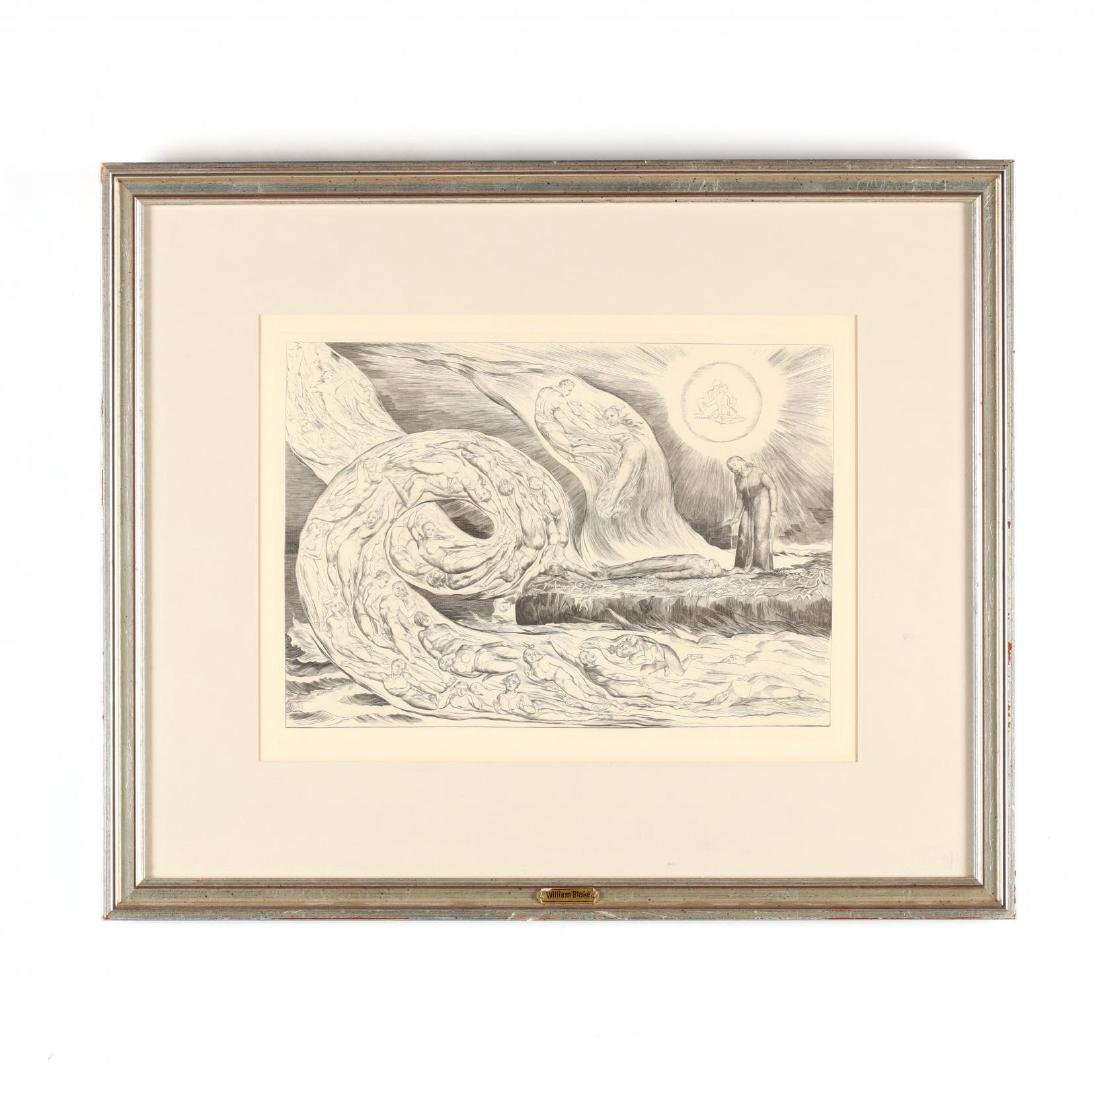 Two Framed Prints - Blake and Gropper - 2